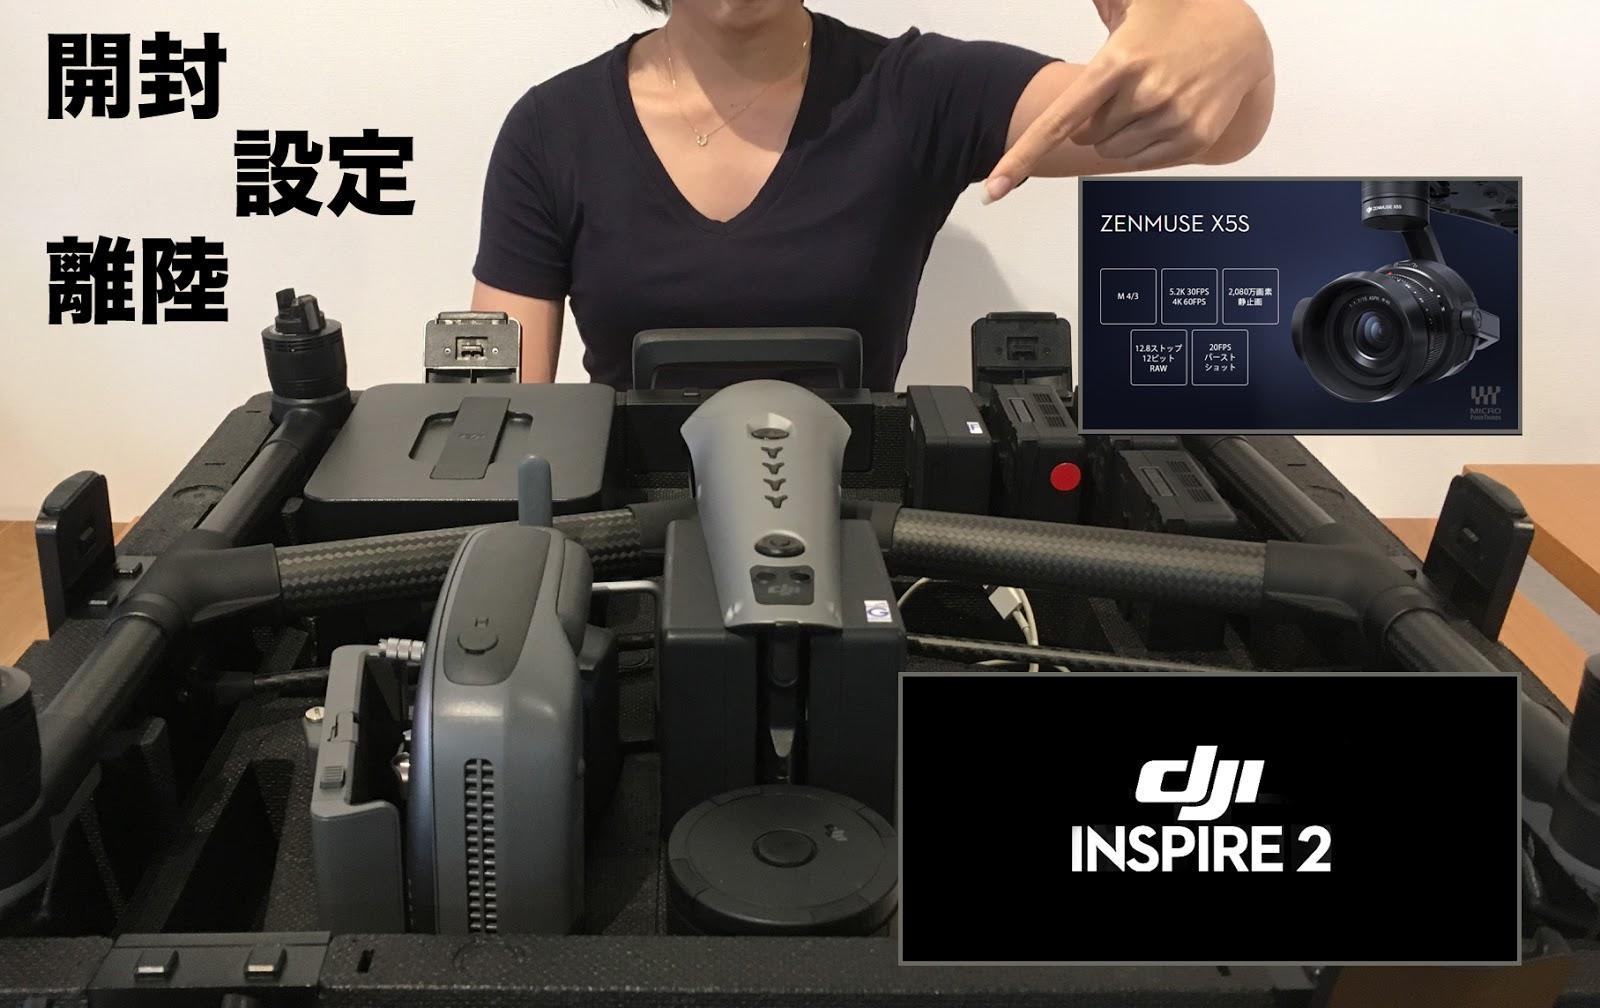 【DJI Inspire2】開封から離陸まで【完全ガイド】